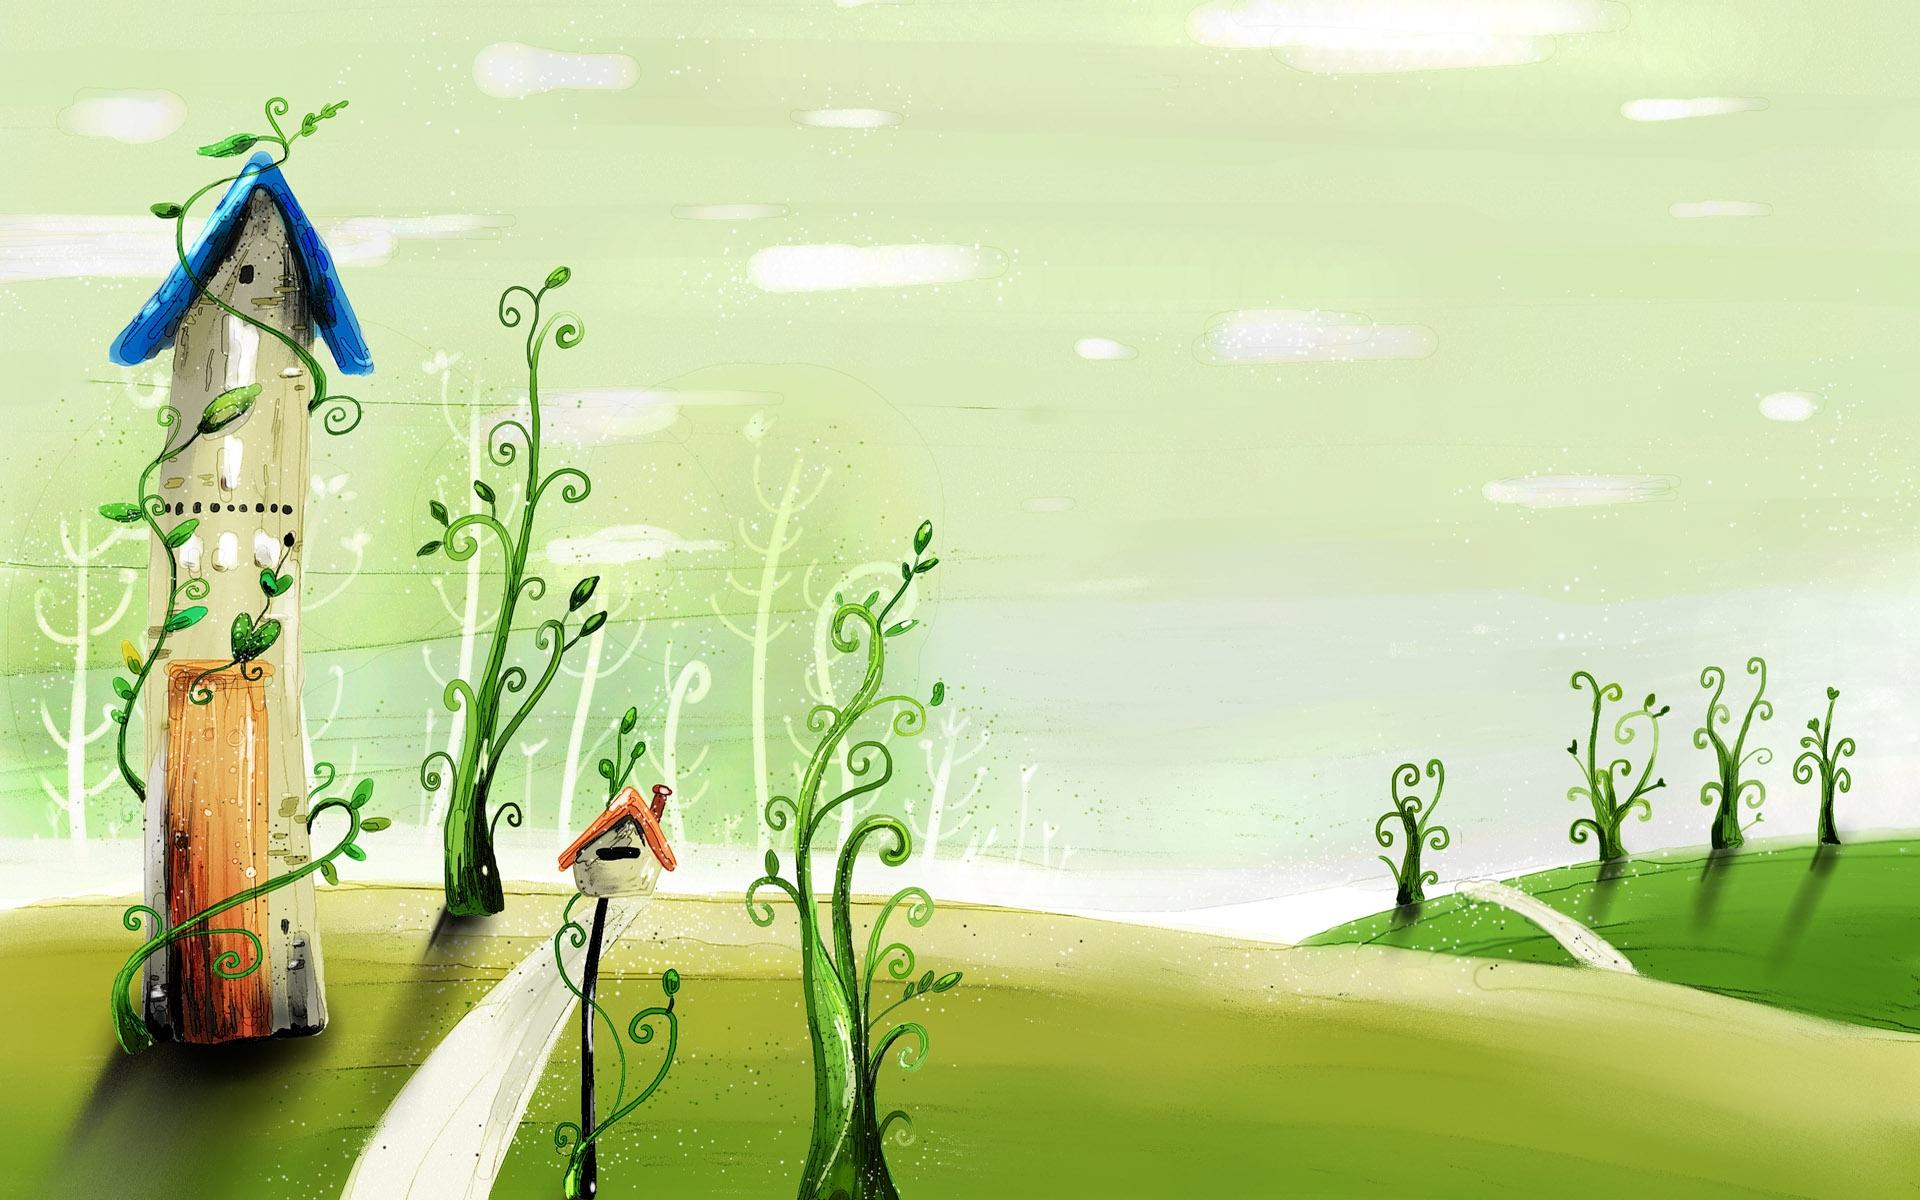 Wallpaper Ilustrasi Bangunan Rumput Hijau Gambar Kartun Musim